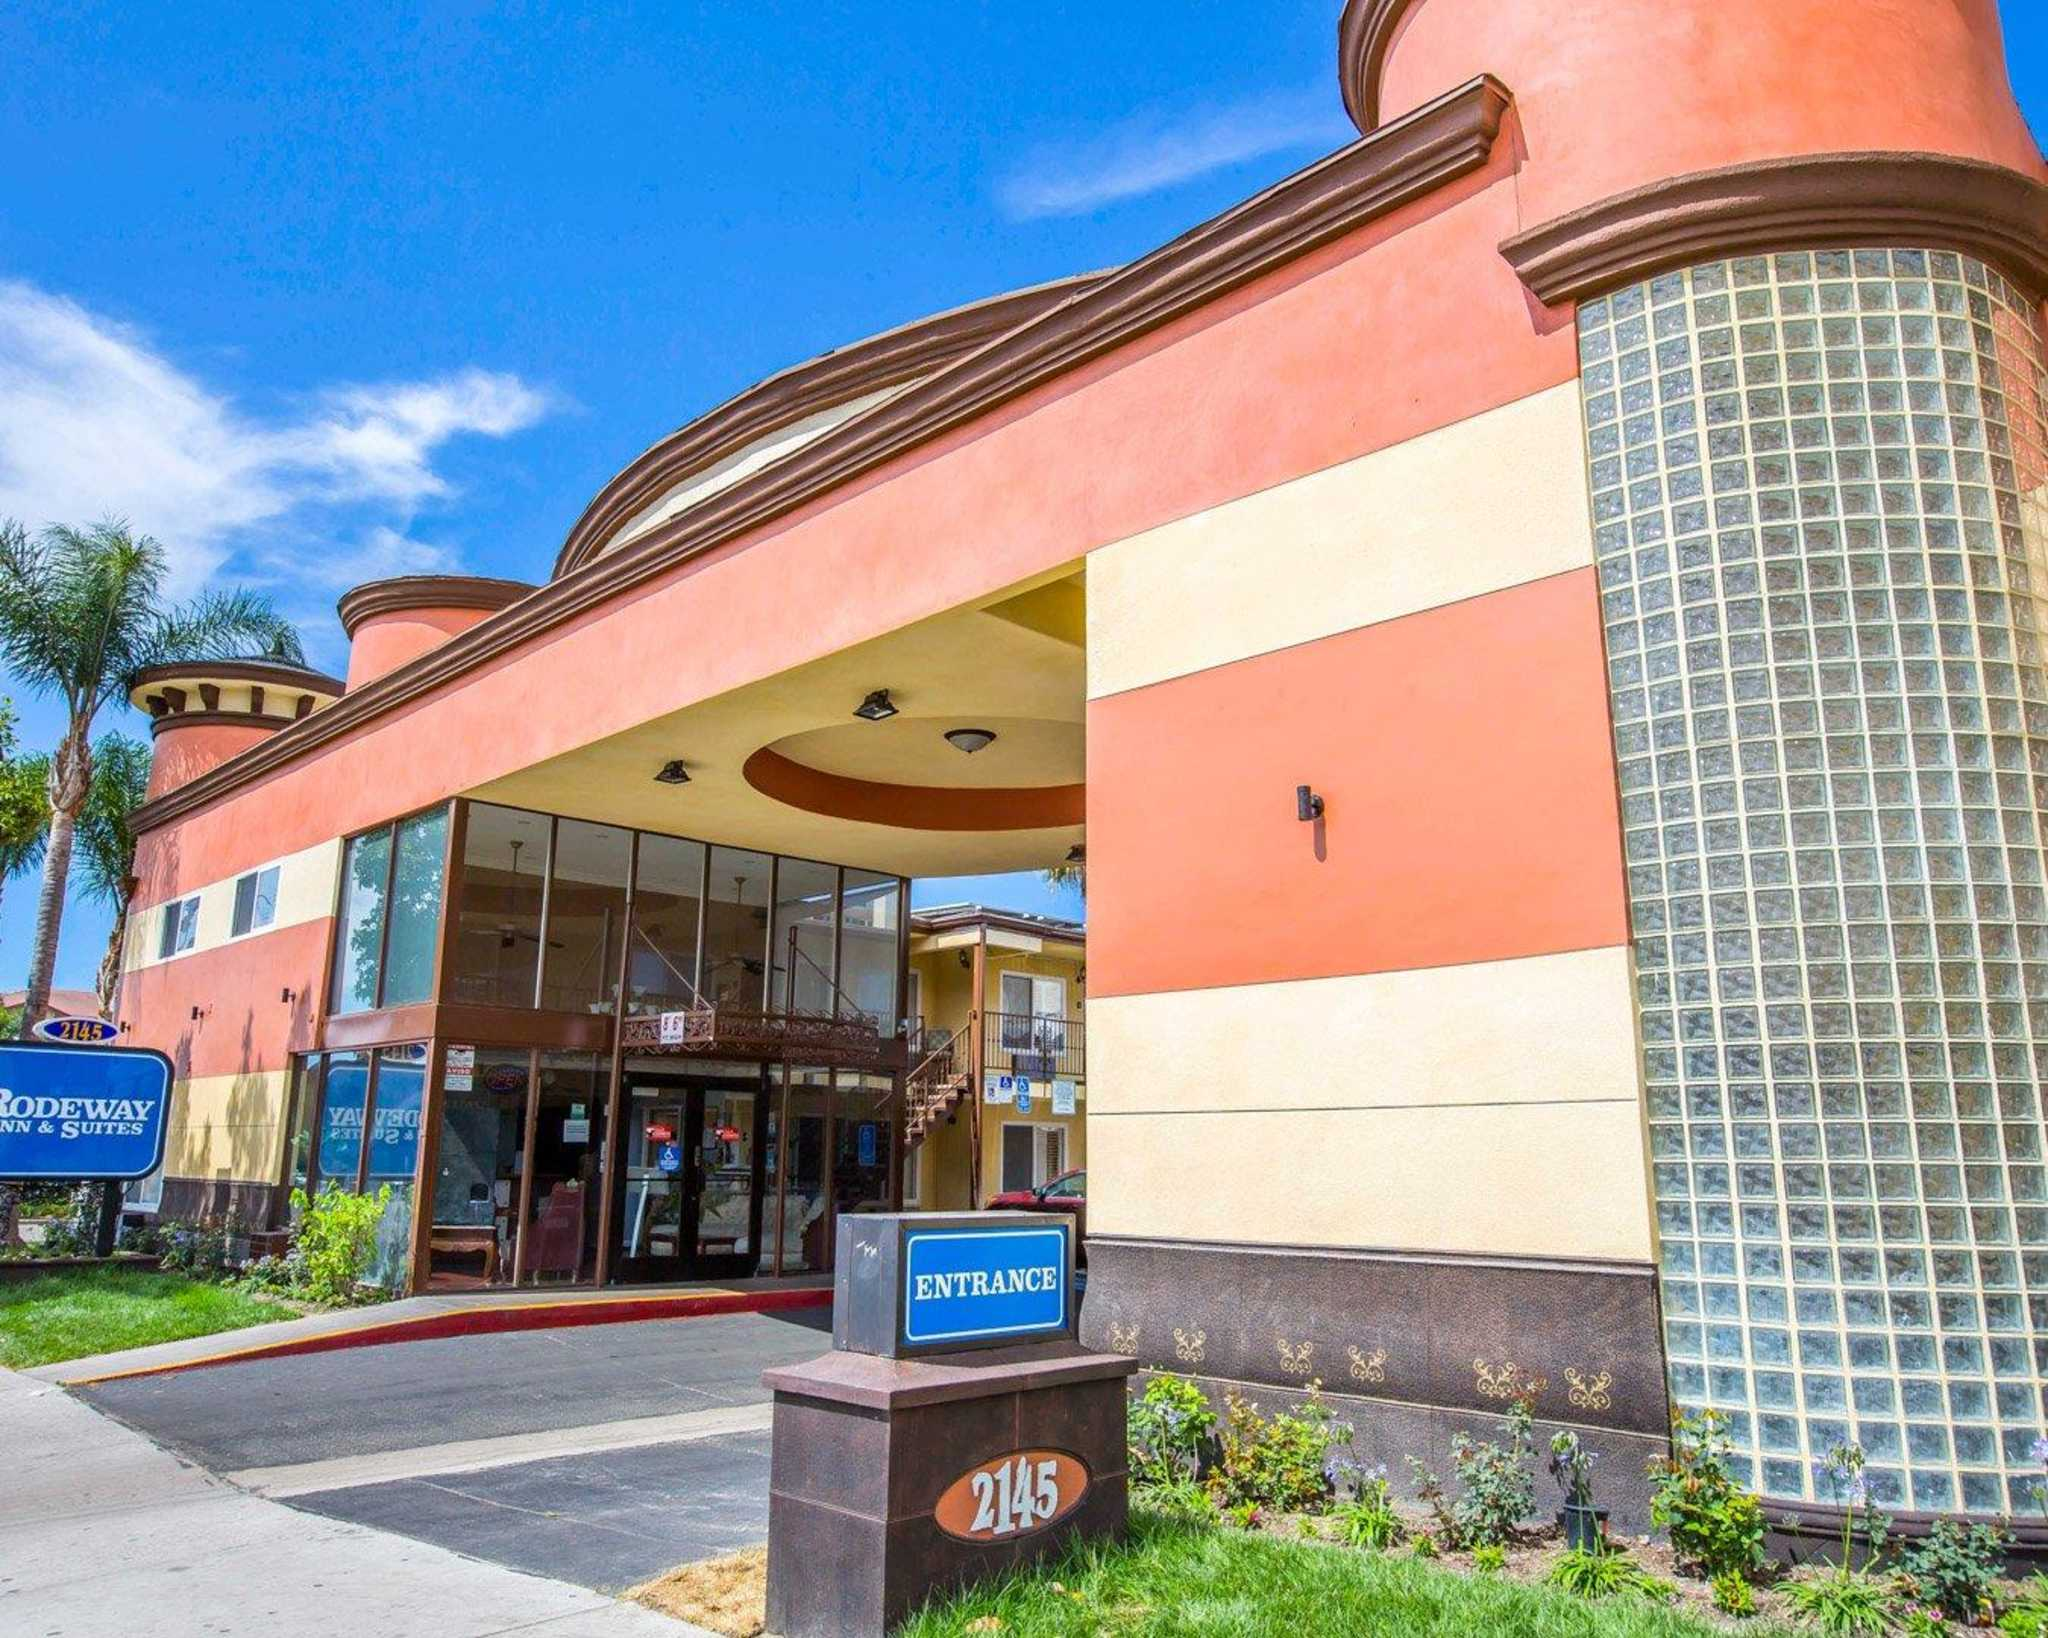 Rodeway Inn & Suites Near Convention Center image 2